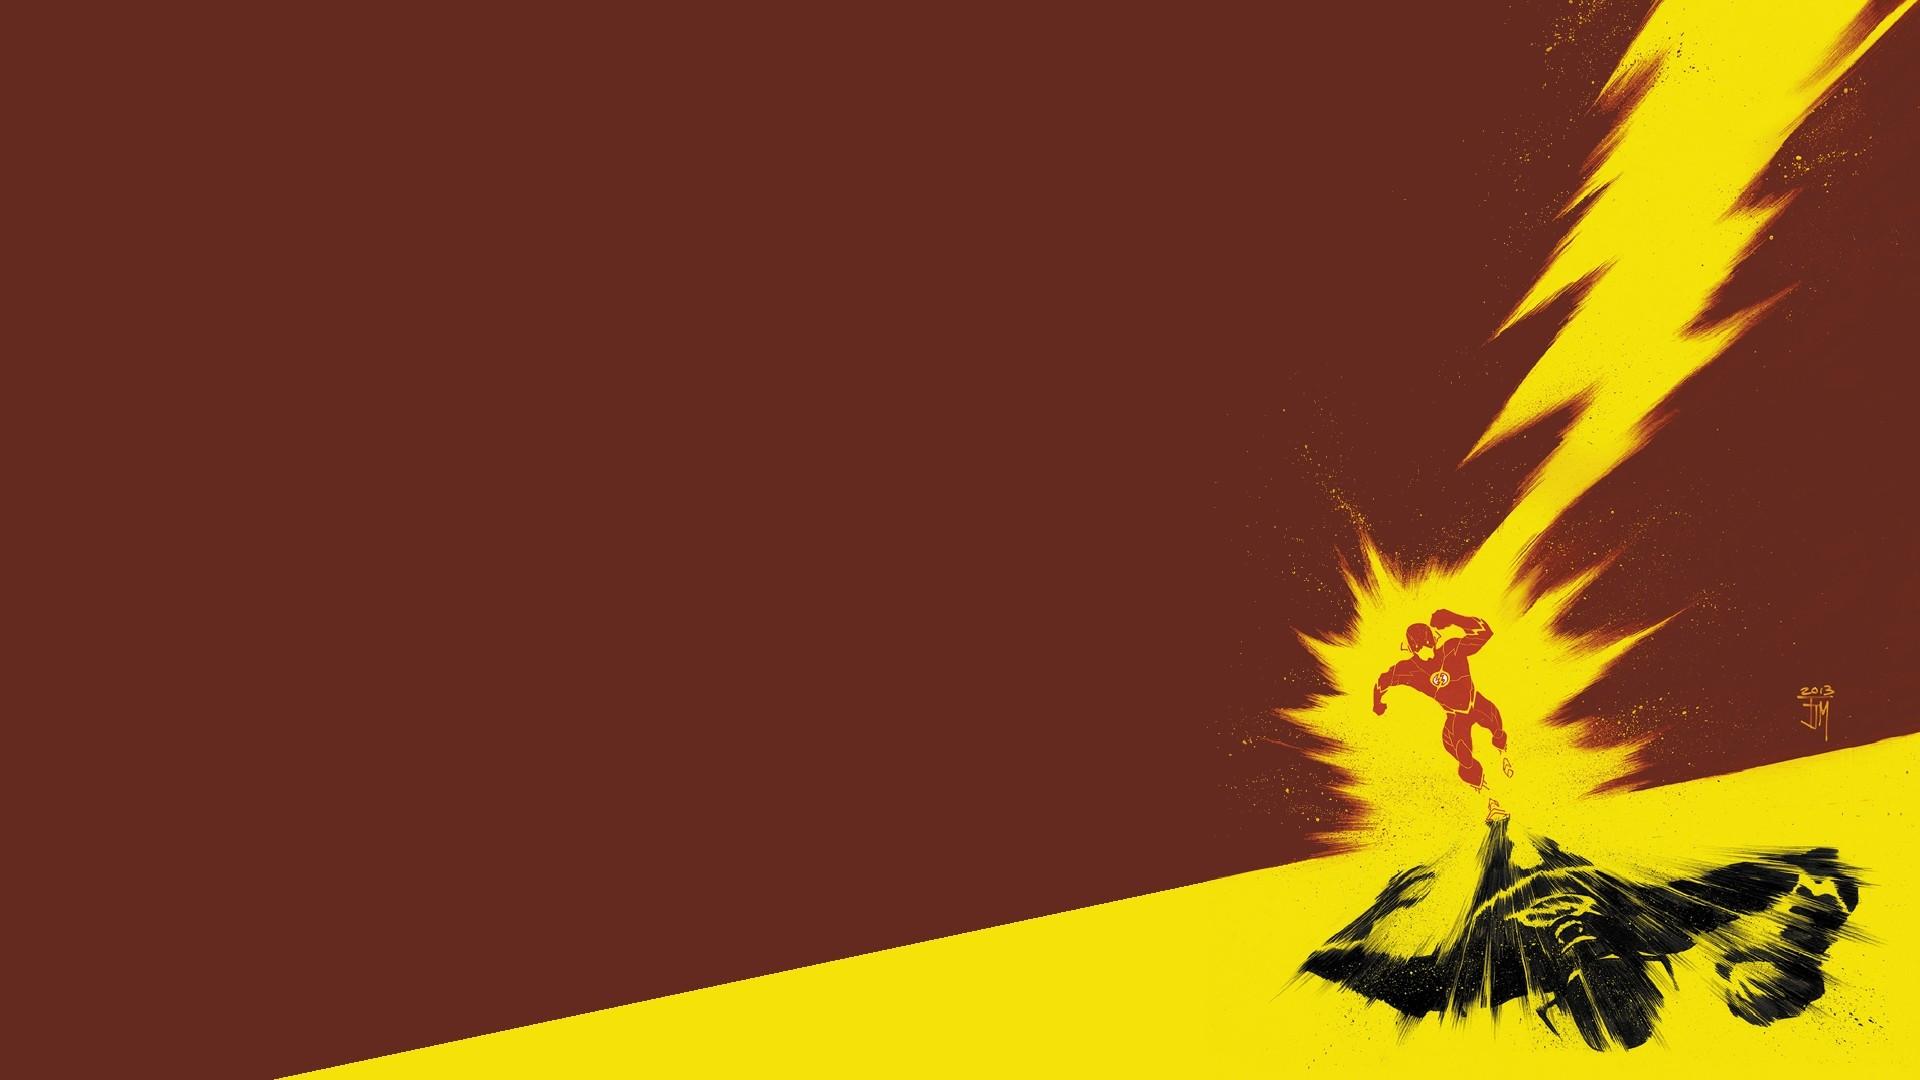 HD Wallpaper   Background ID:470233. Comics Flash